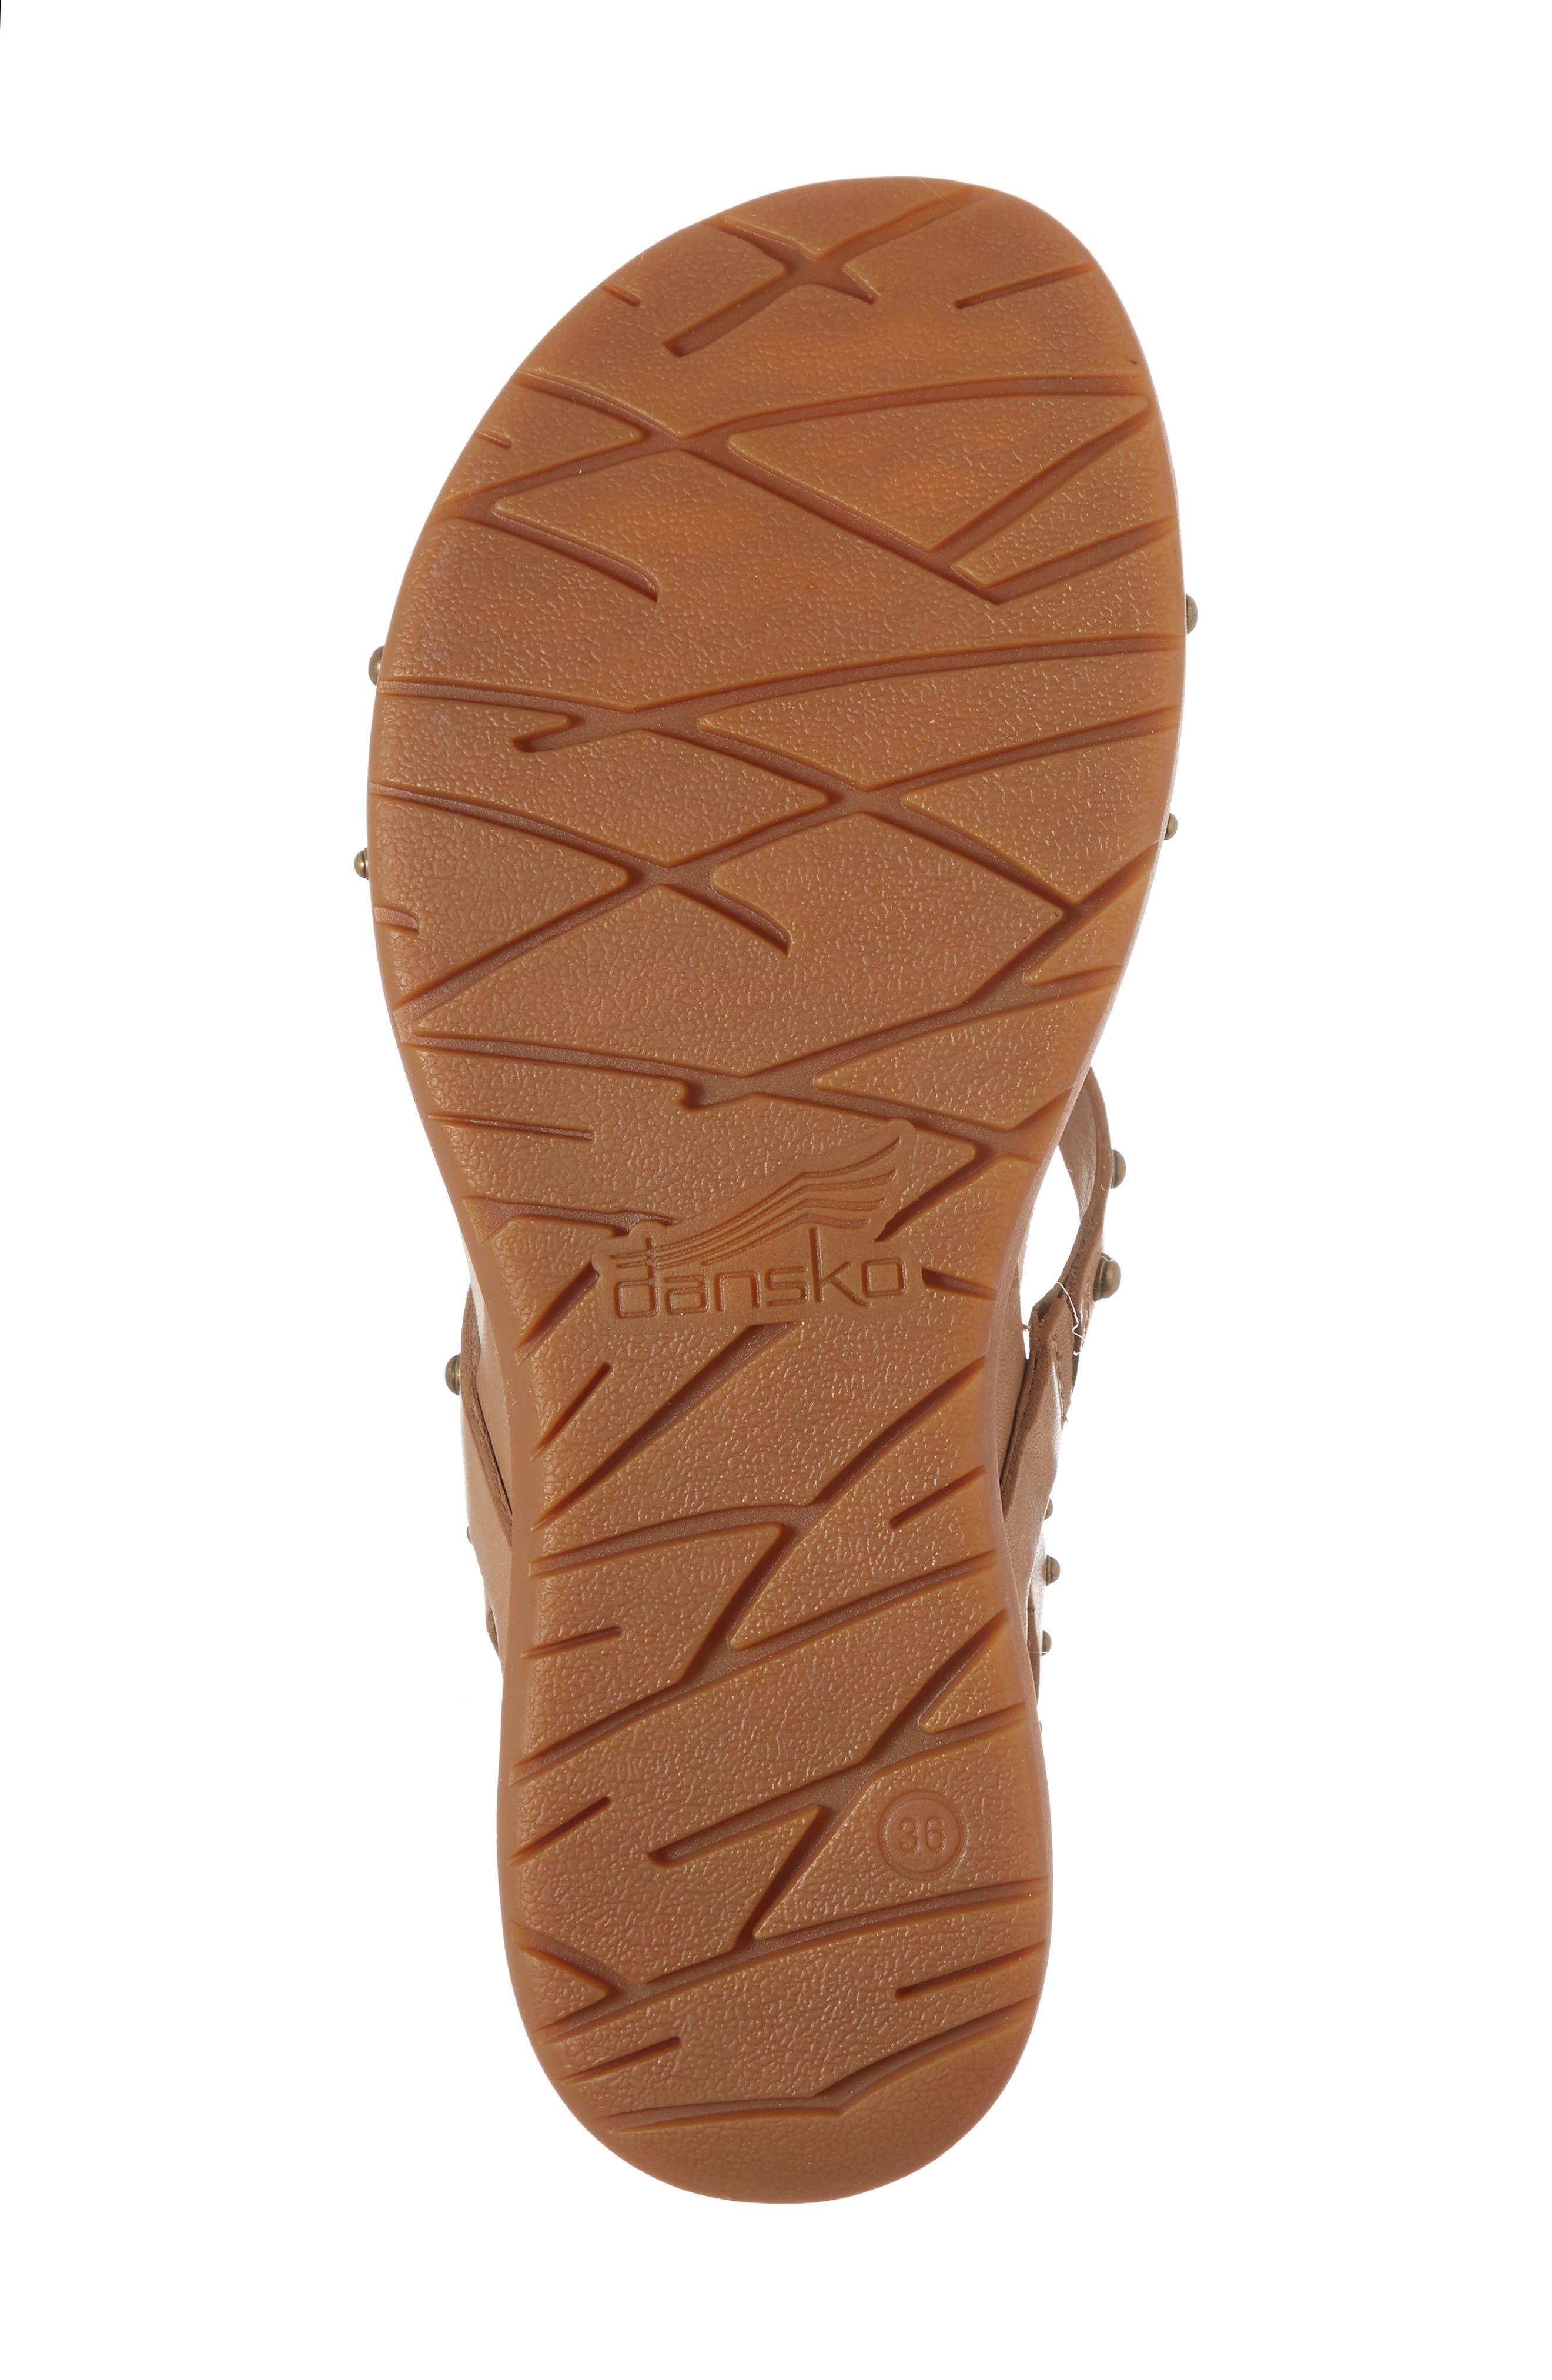 Brigitte Studded Strappy Sandal,                             Alternate thumbnail 6, color,                             Sand Leather